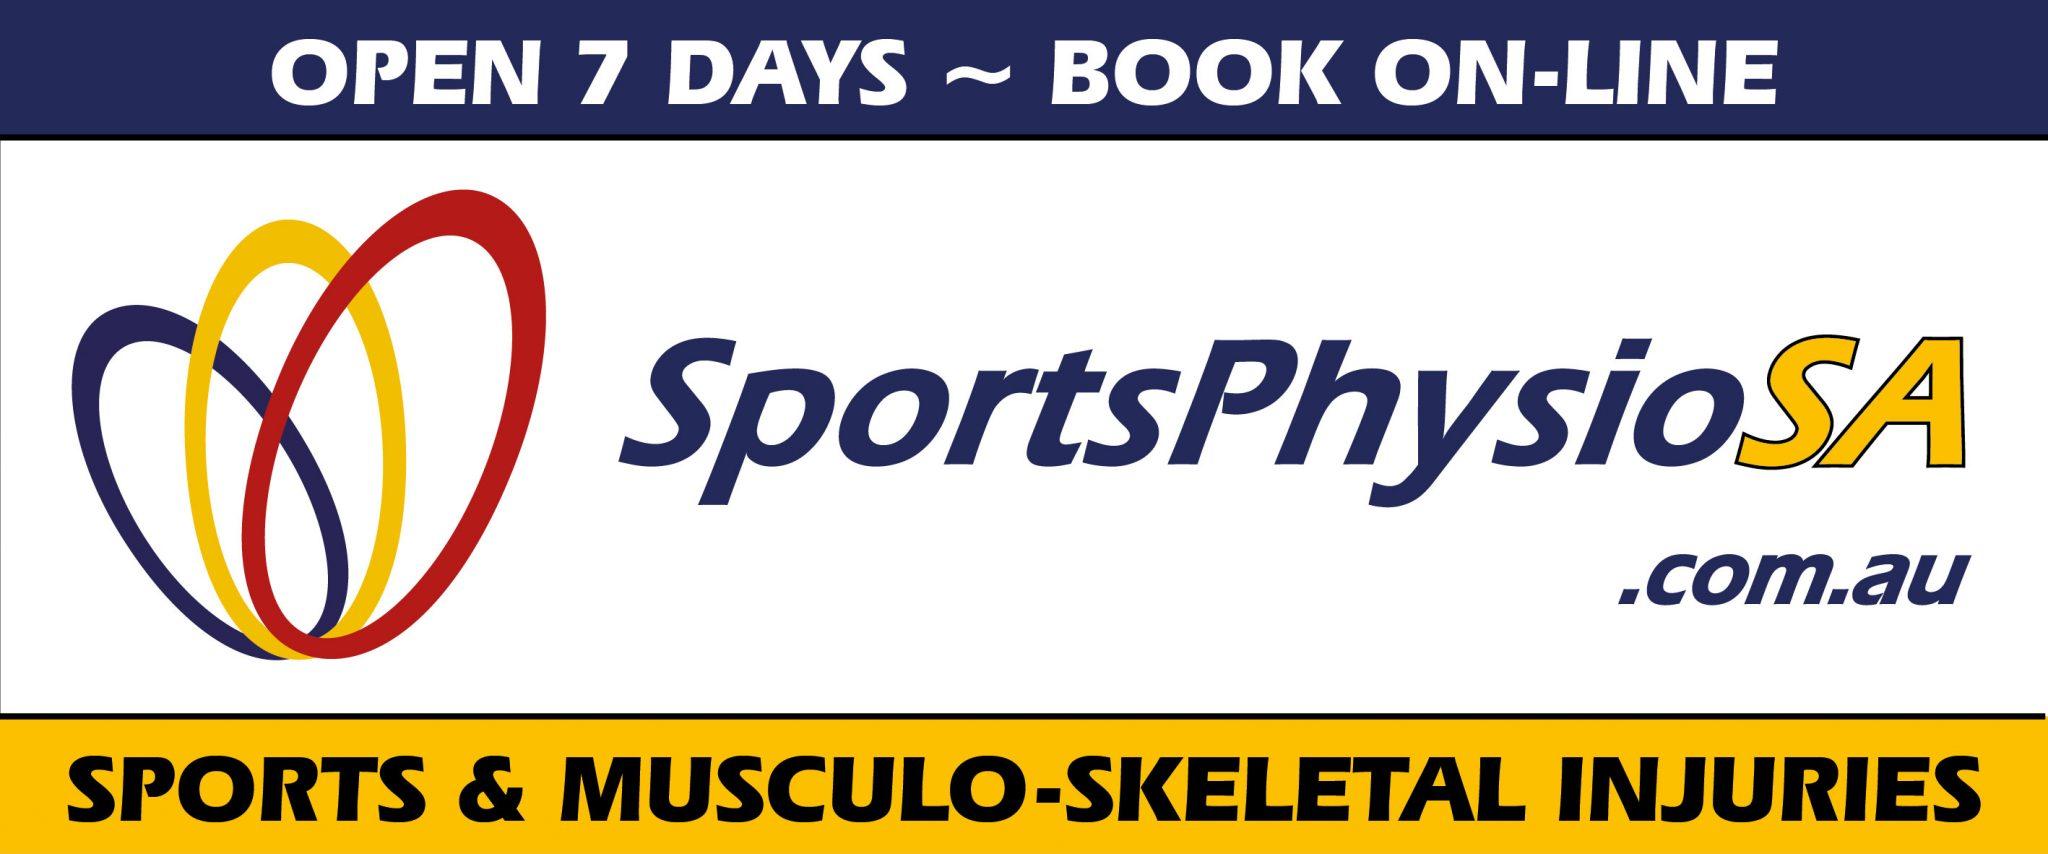 sportsphysiosa